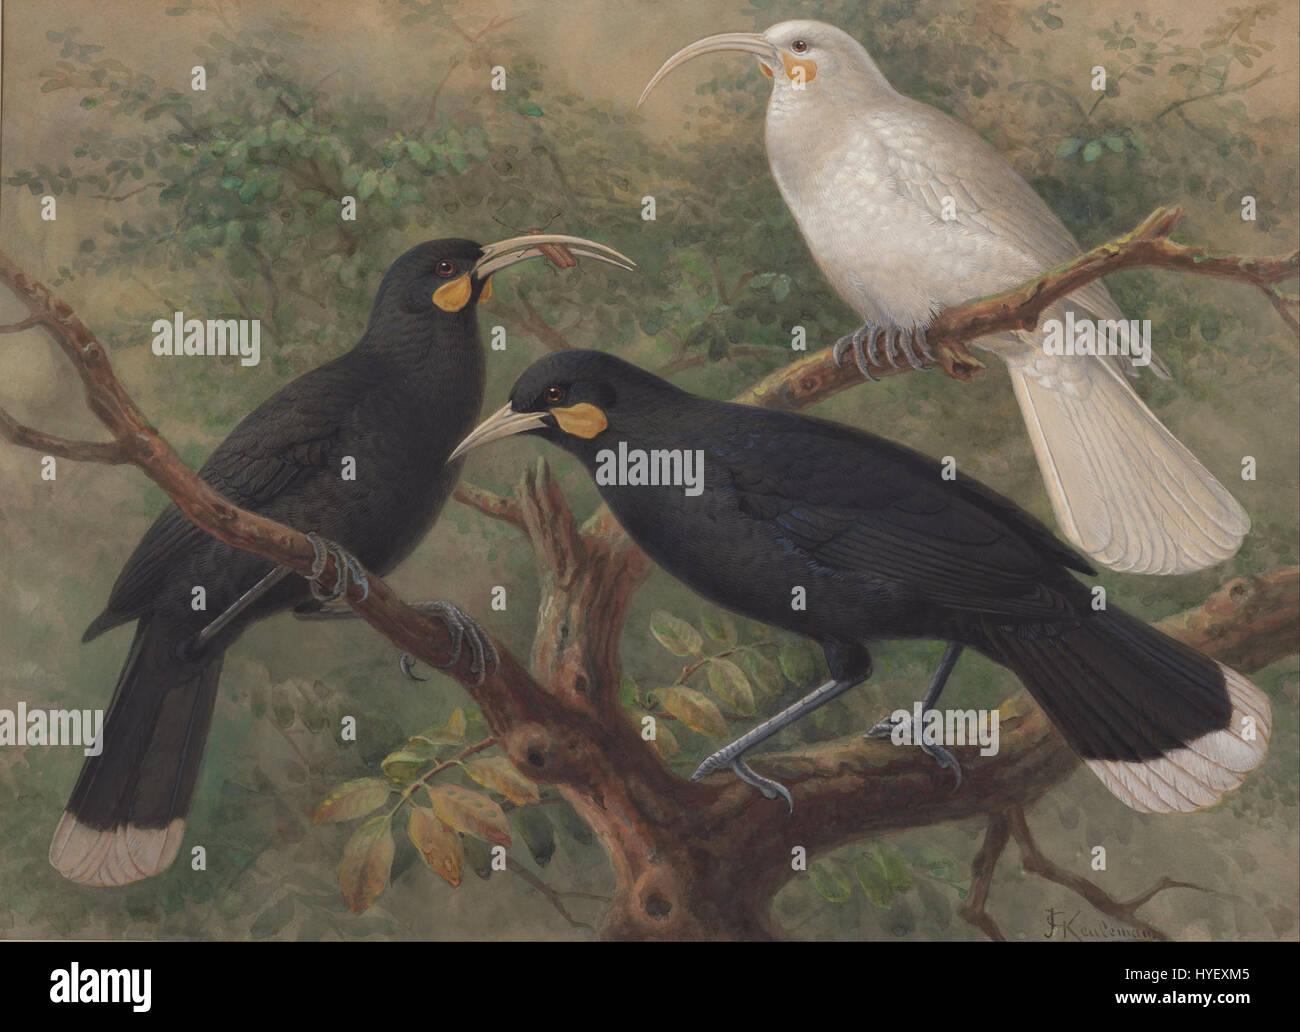 J. G. Keulemans   Three Huia (Heteralocha acutirostris)   Google Art Project Stock Photo